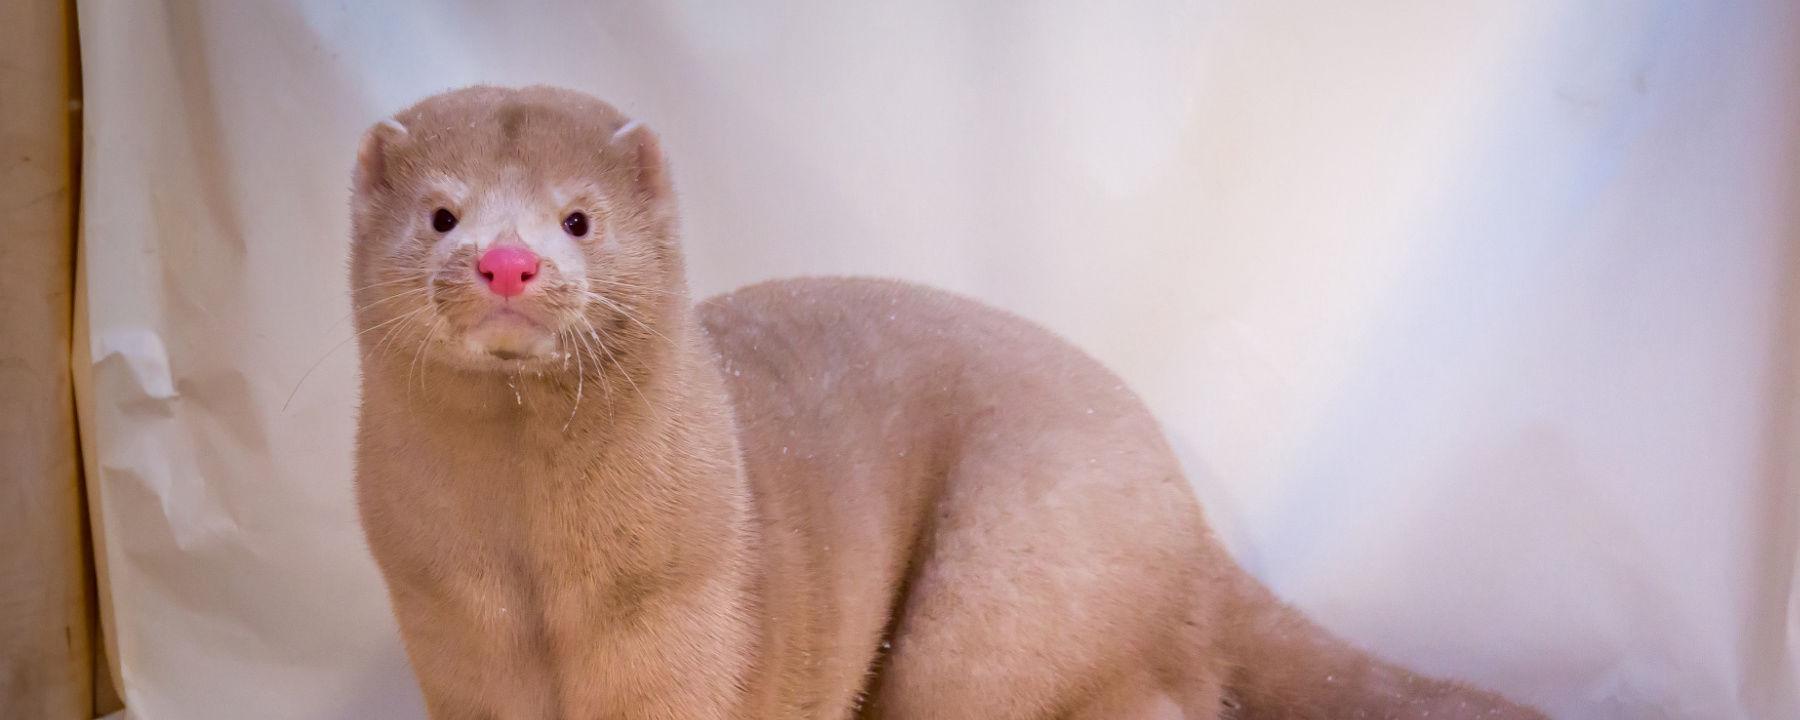 Denmark to Cull 17 Million Mink Amid SARS-CoV-2 Mutation Concerns